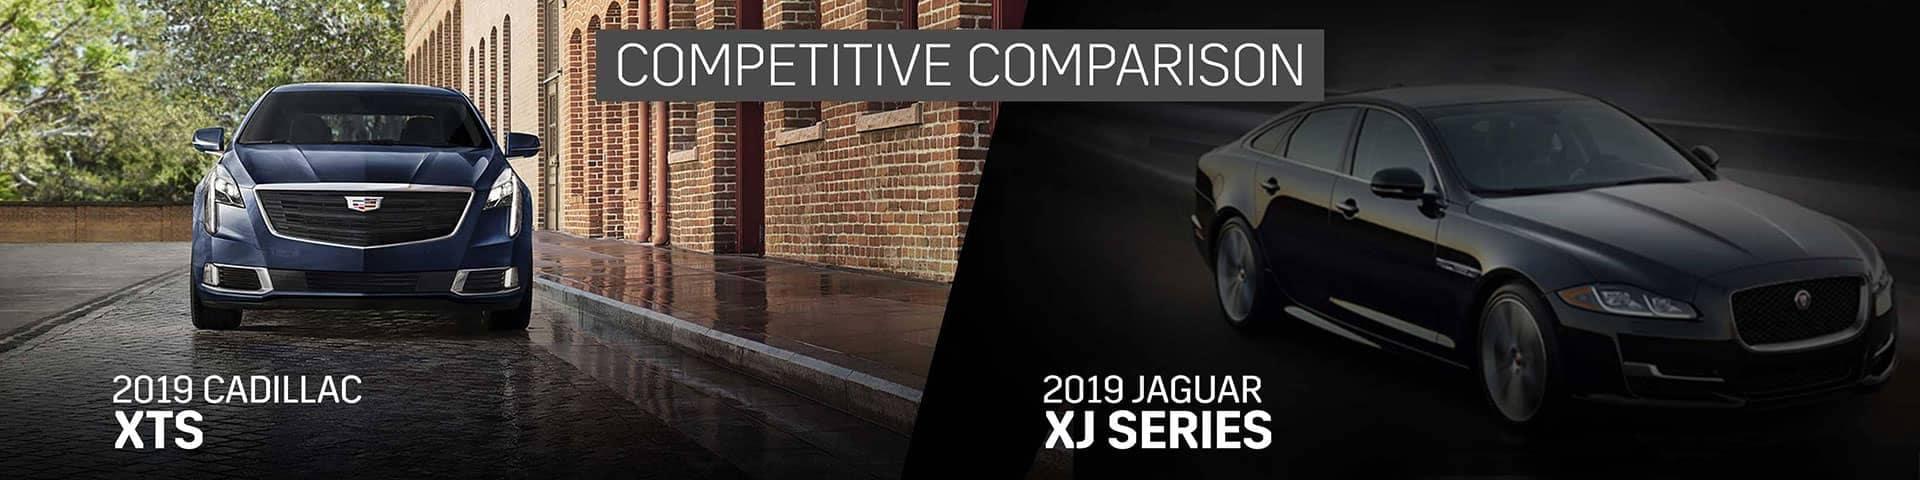 5-compare-2019-cadillac-xts